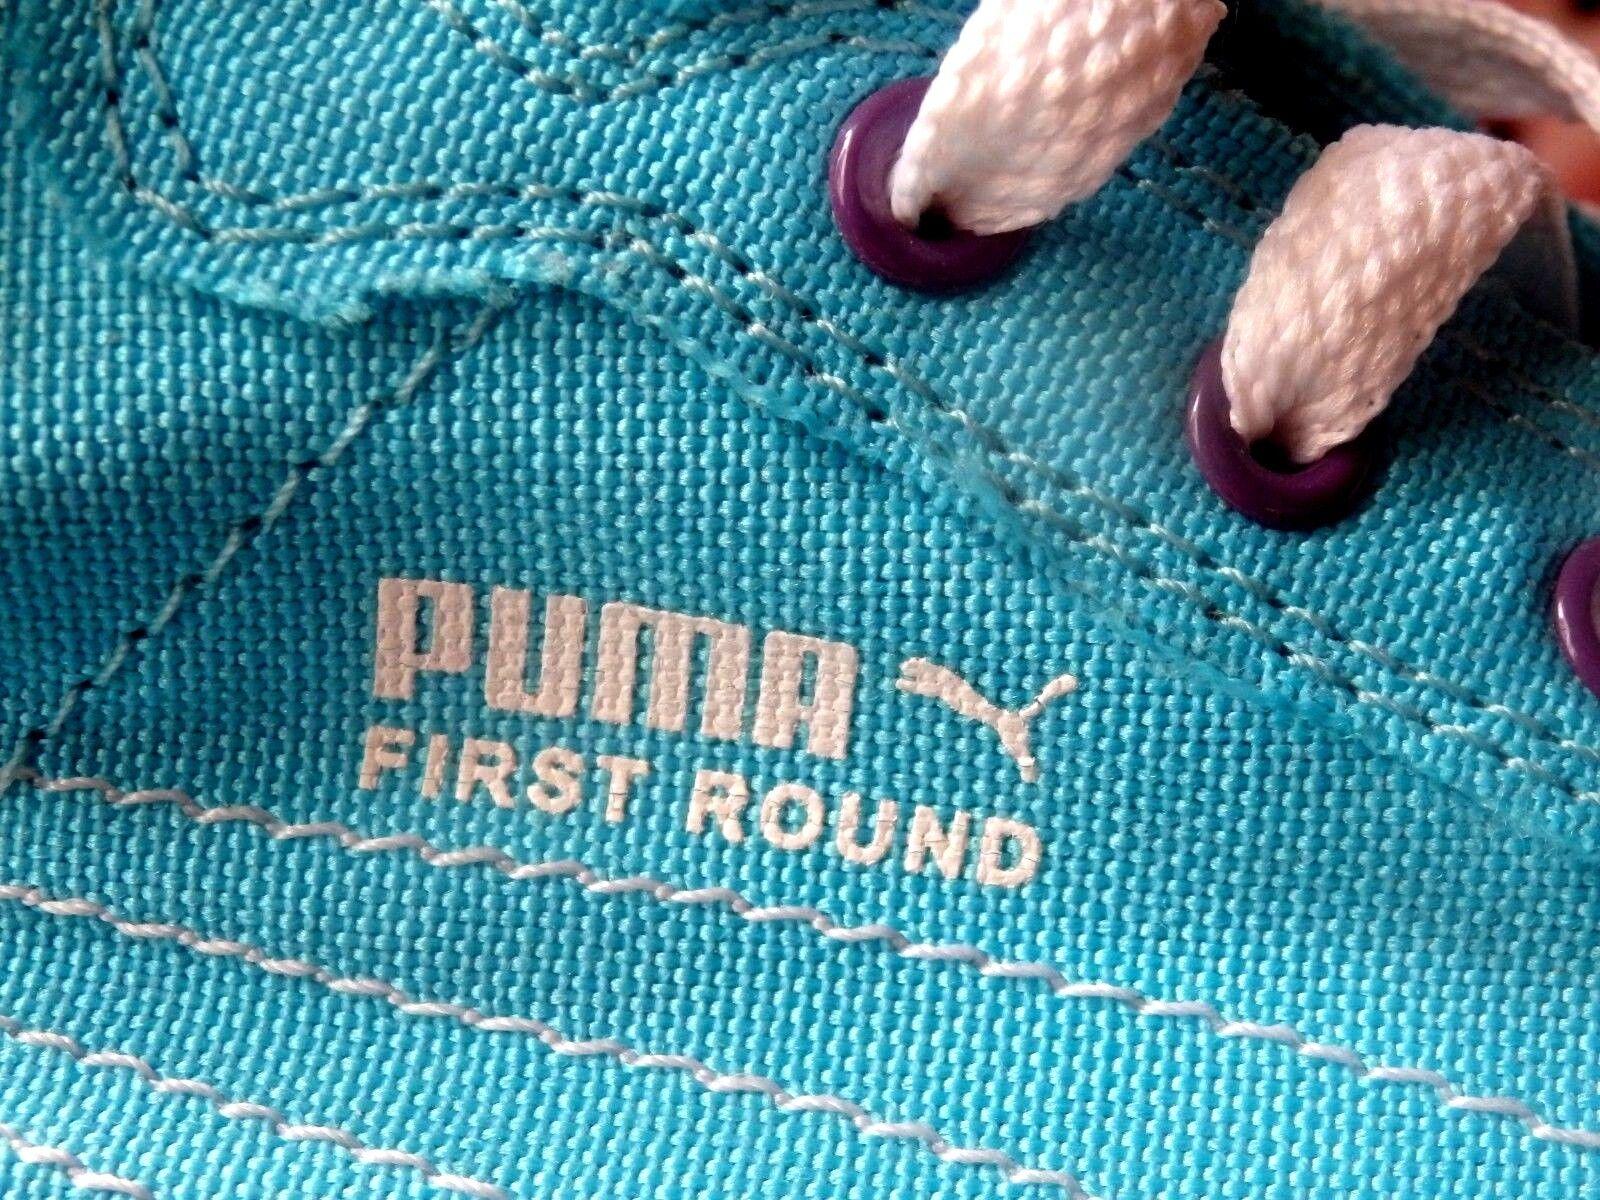 Puma First Round Safari 41 Turnschuhe Sneaker Hi Gr 41 Safari 314aa3